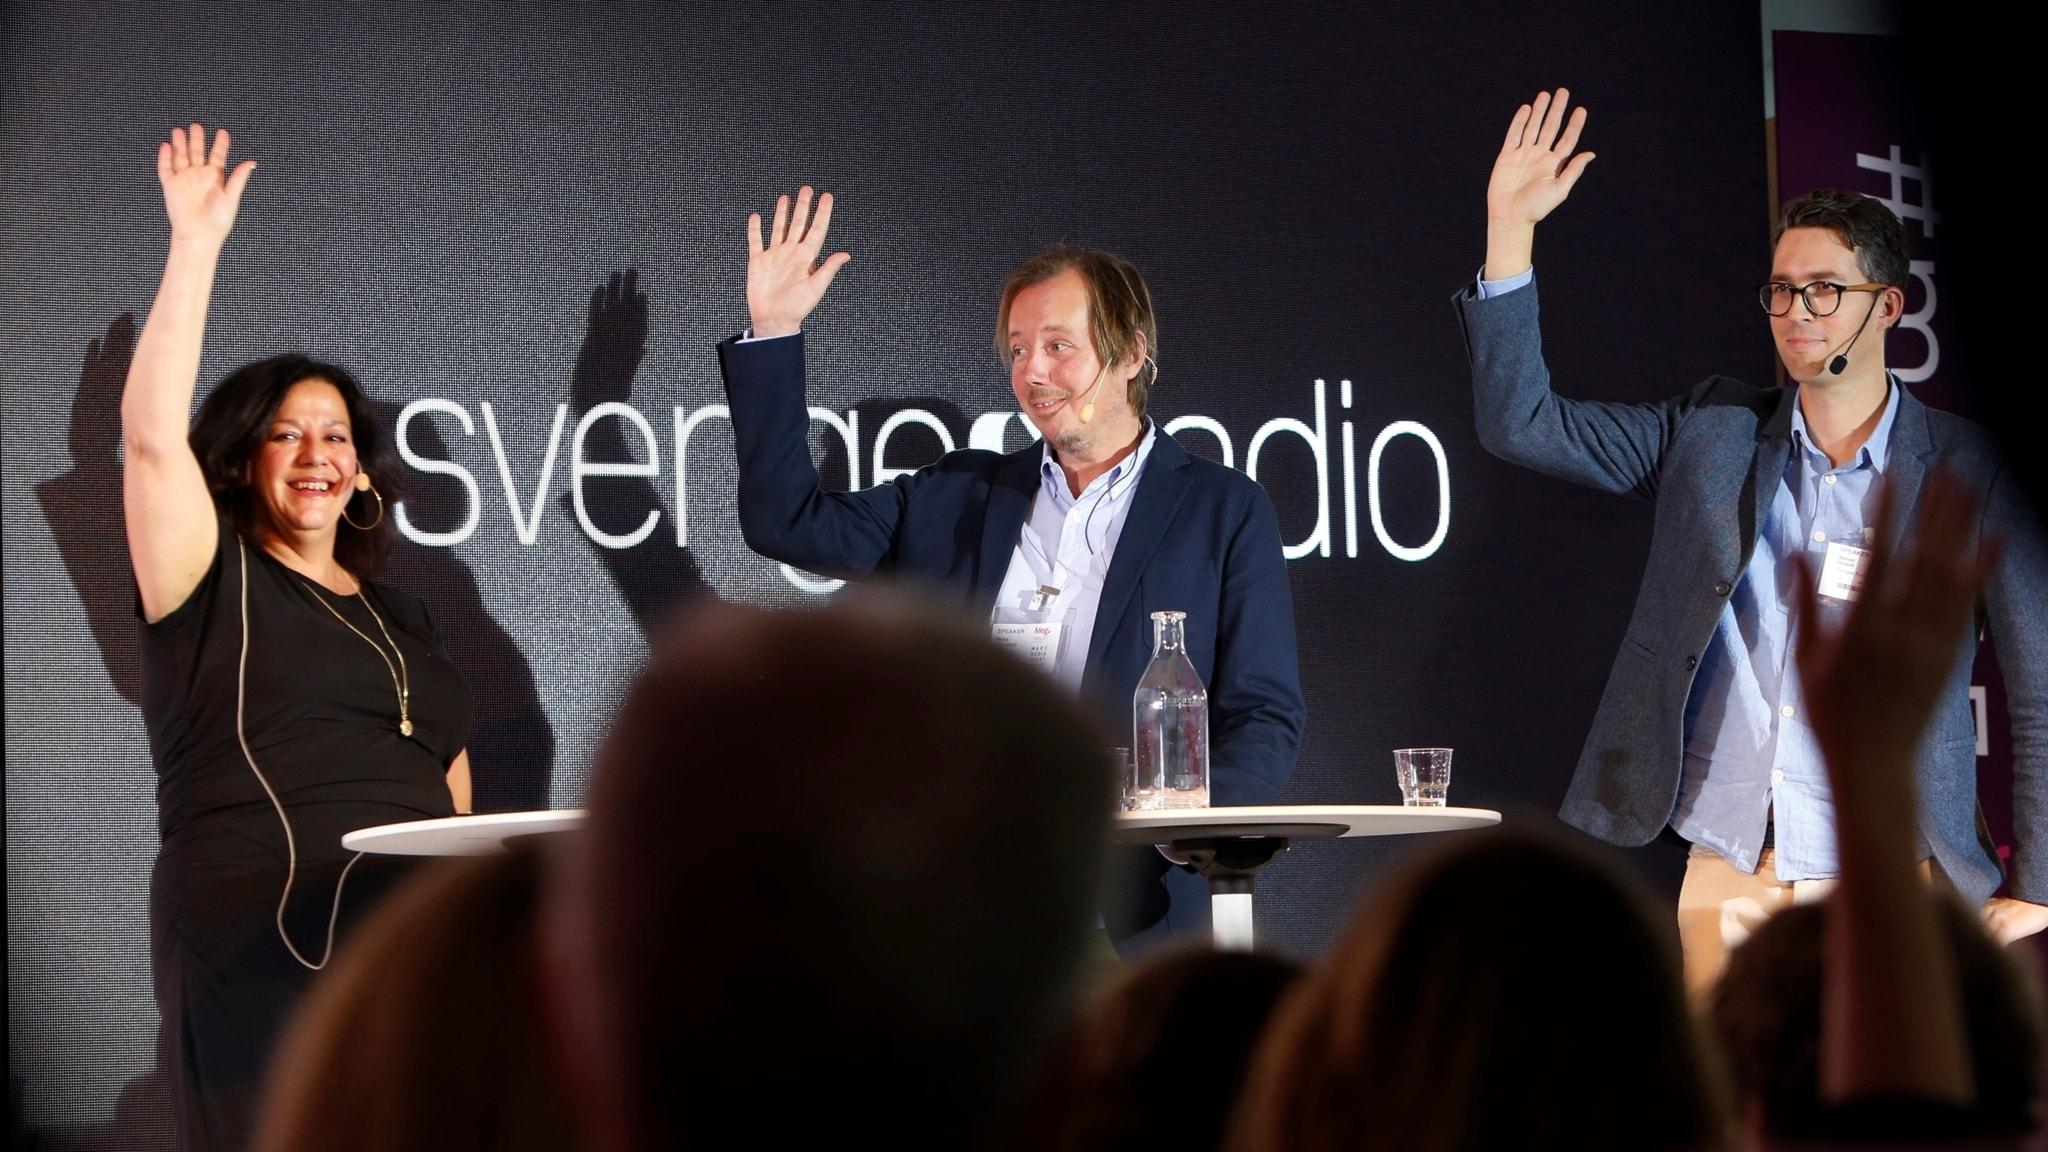 Pia Kalischer (moderator), Måns Ulvestam och Simon Gooch